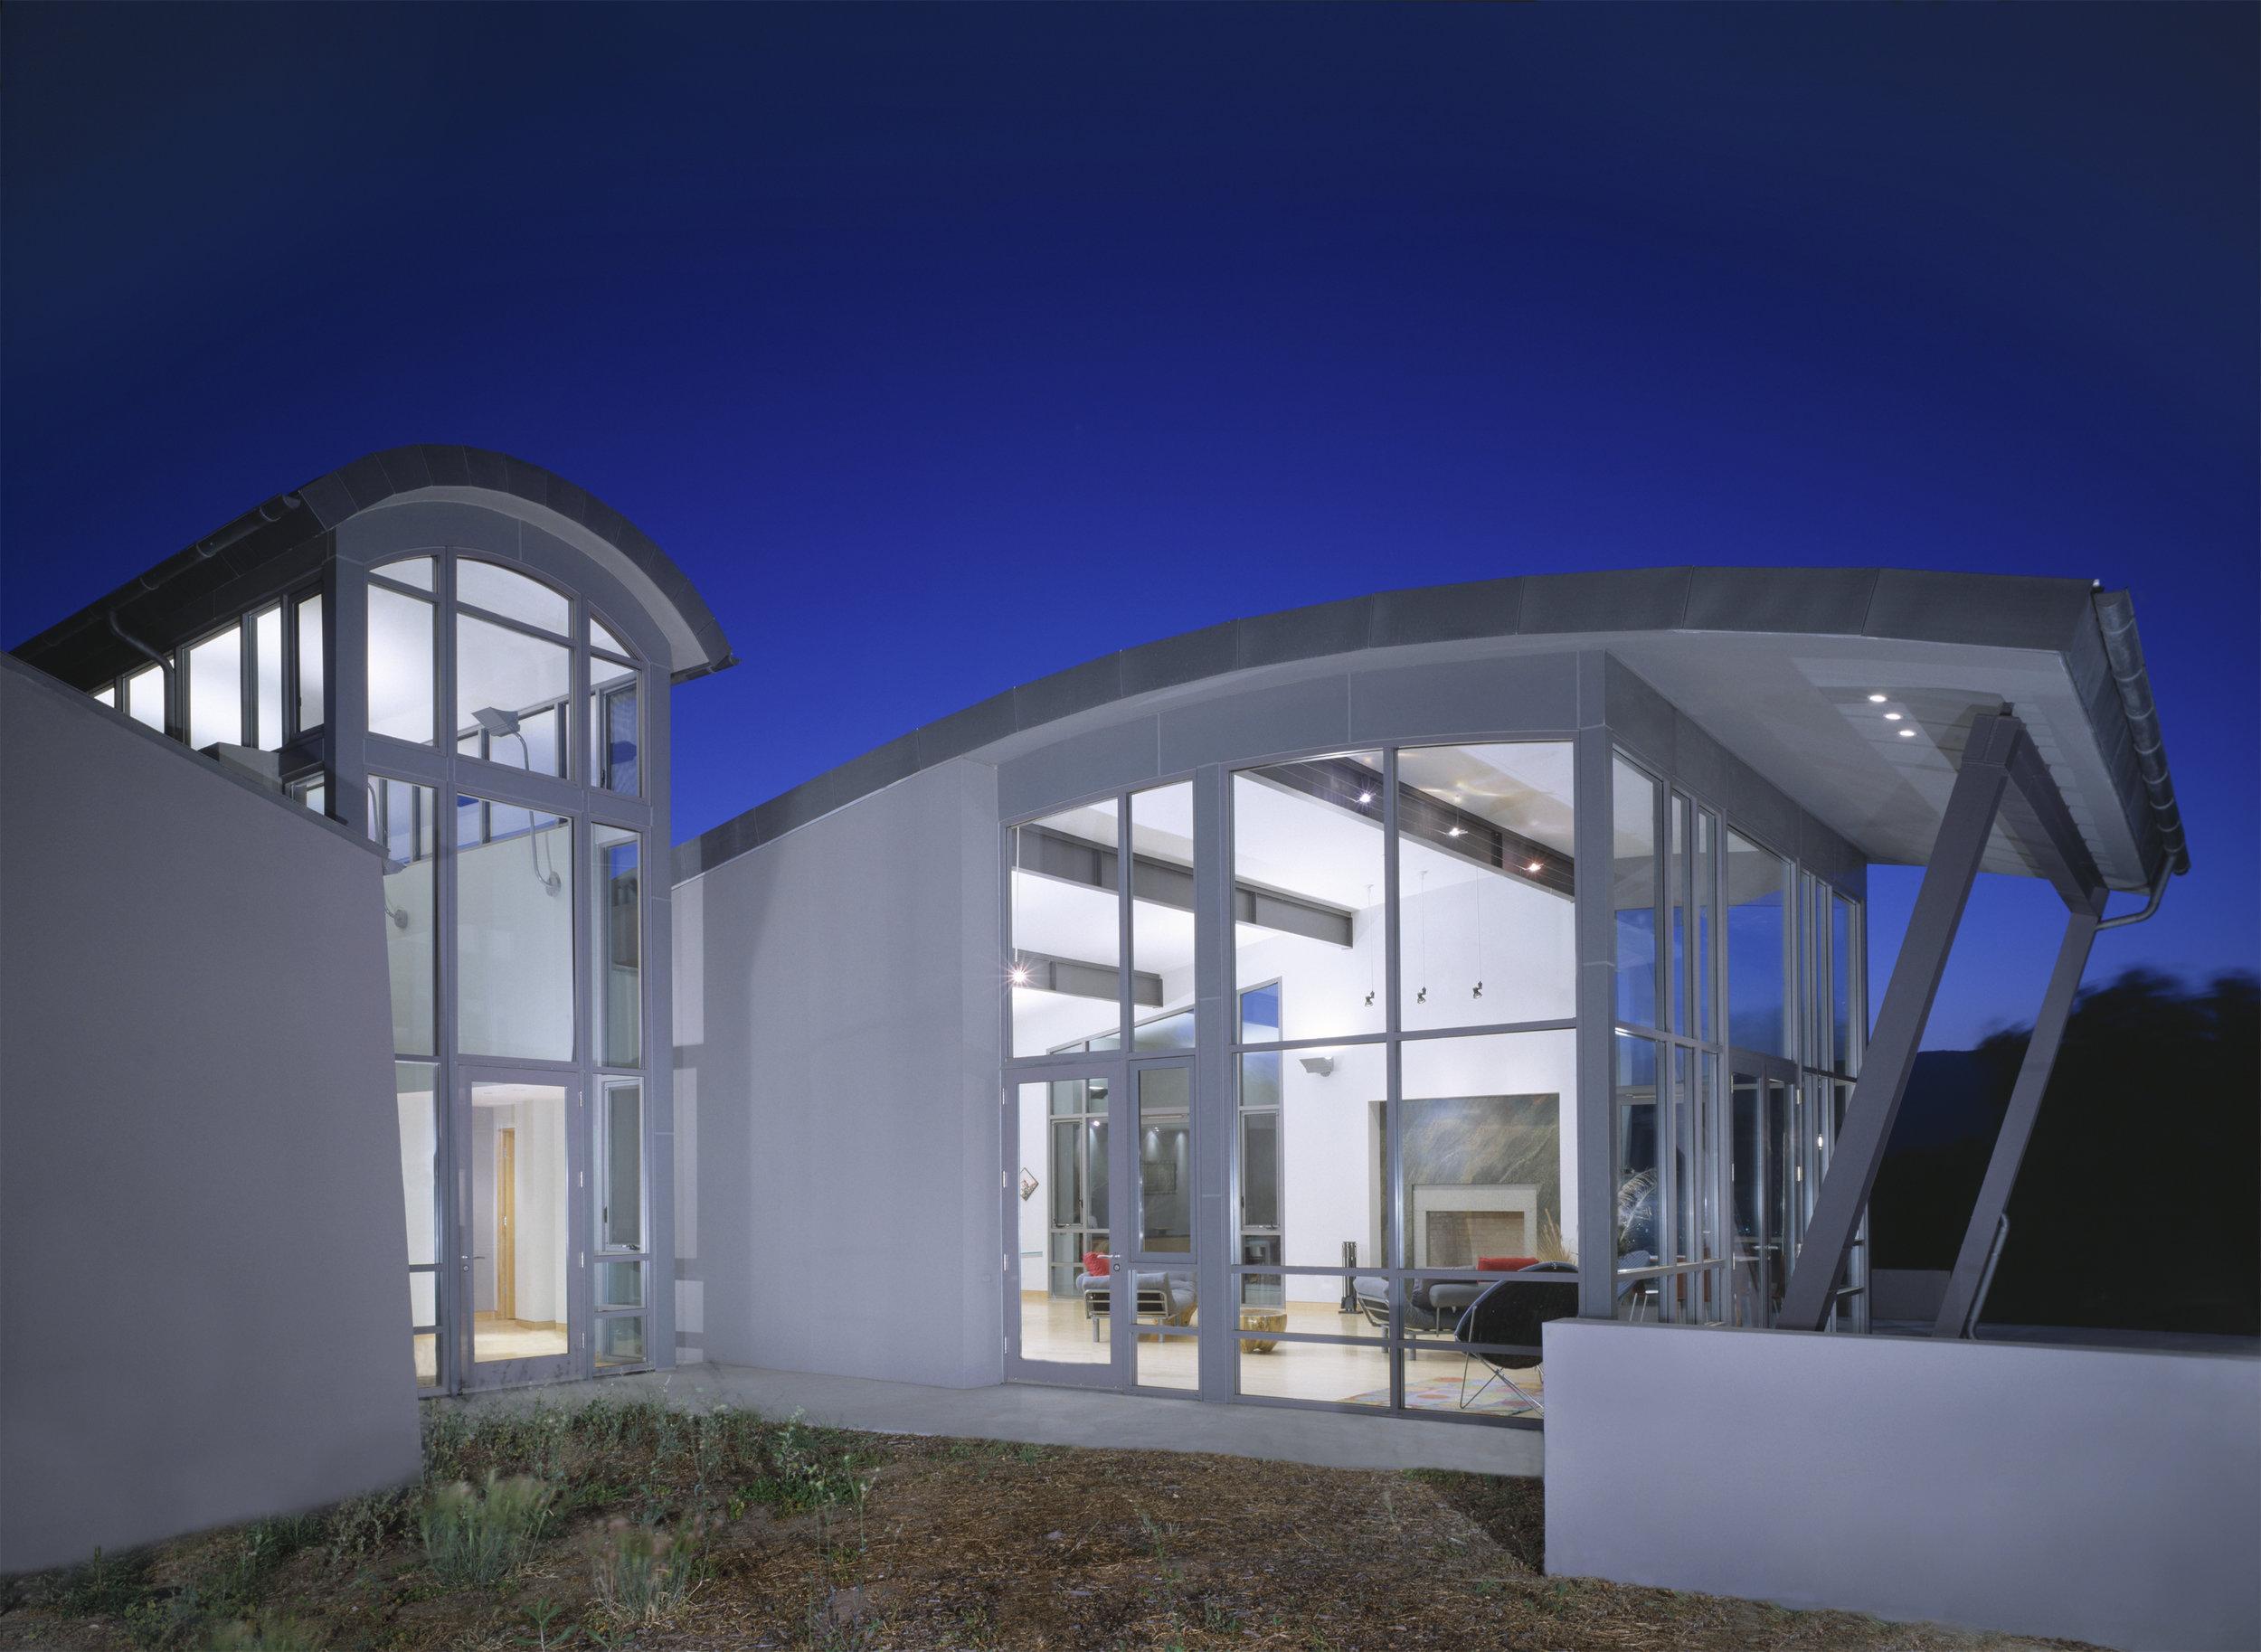 teton-landis, exterior living room(8x10).jpg